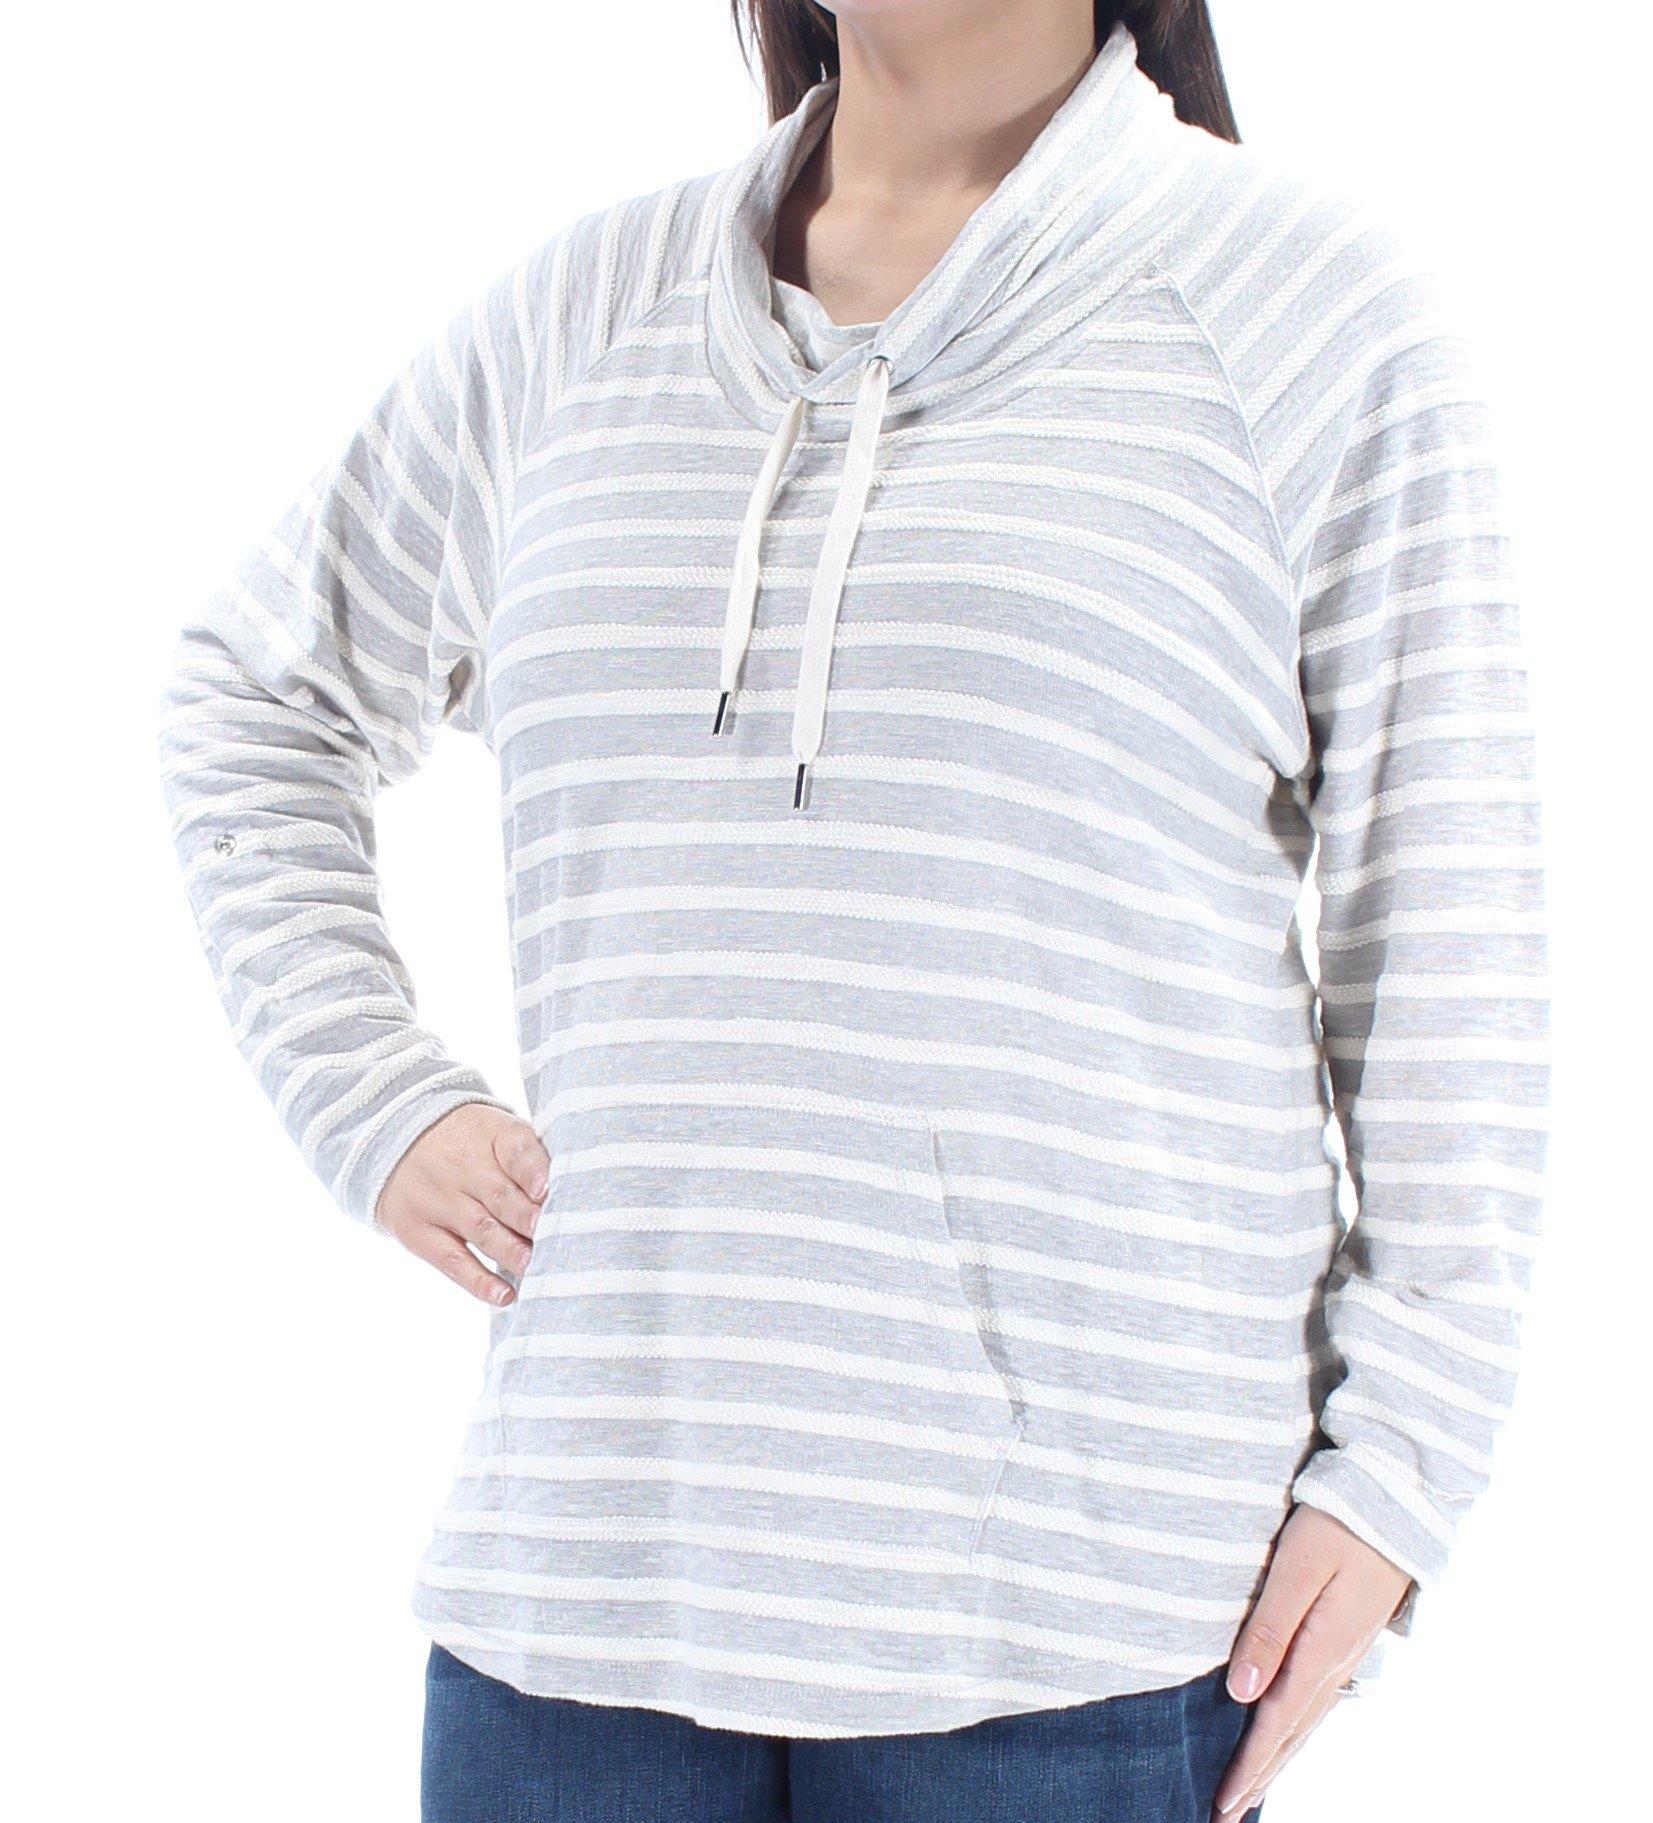 Style & Co. Womens Plus Striped Cowl Neck Sweatshirt Gray 1X